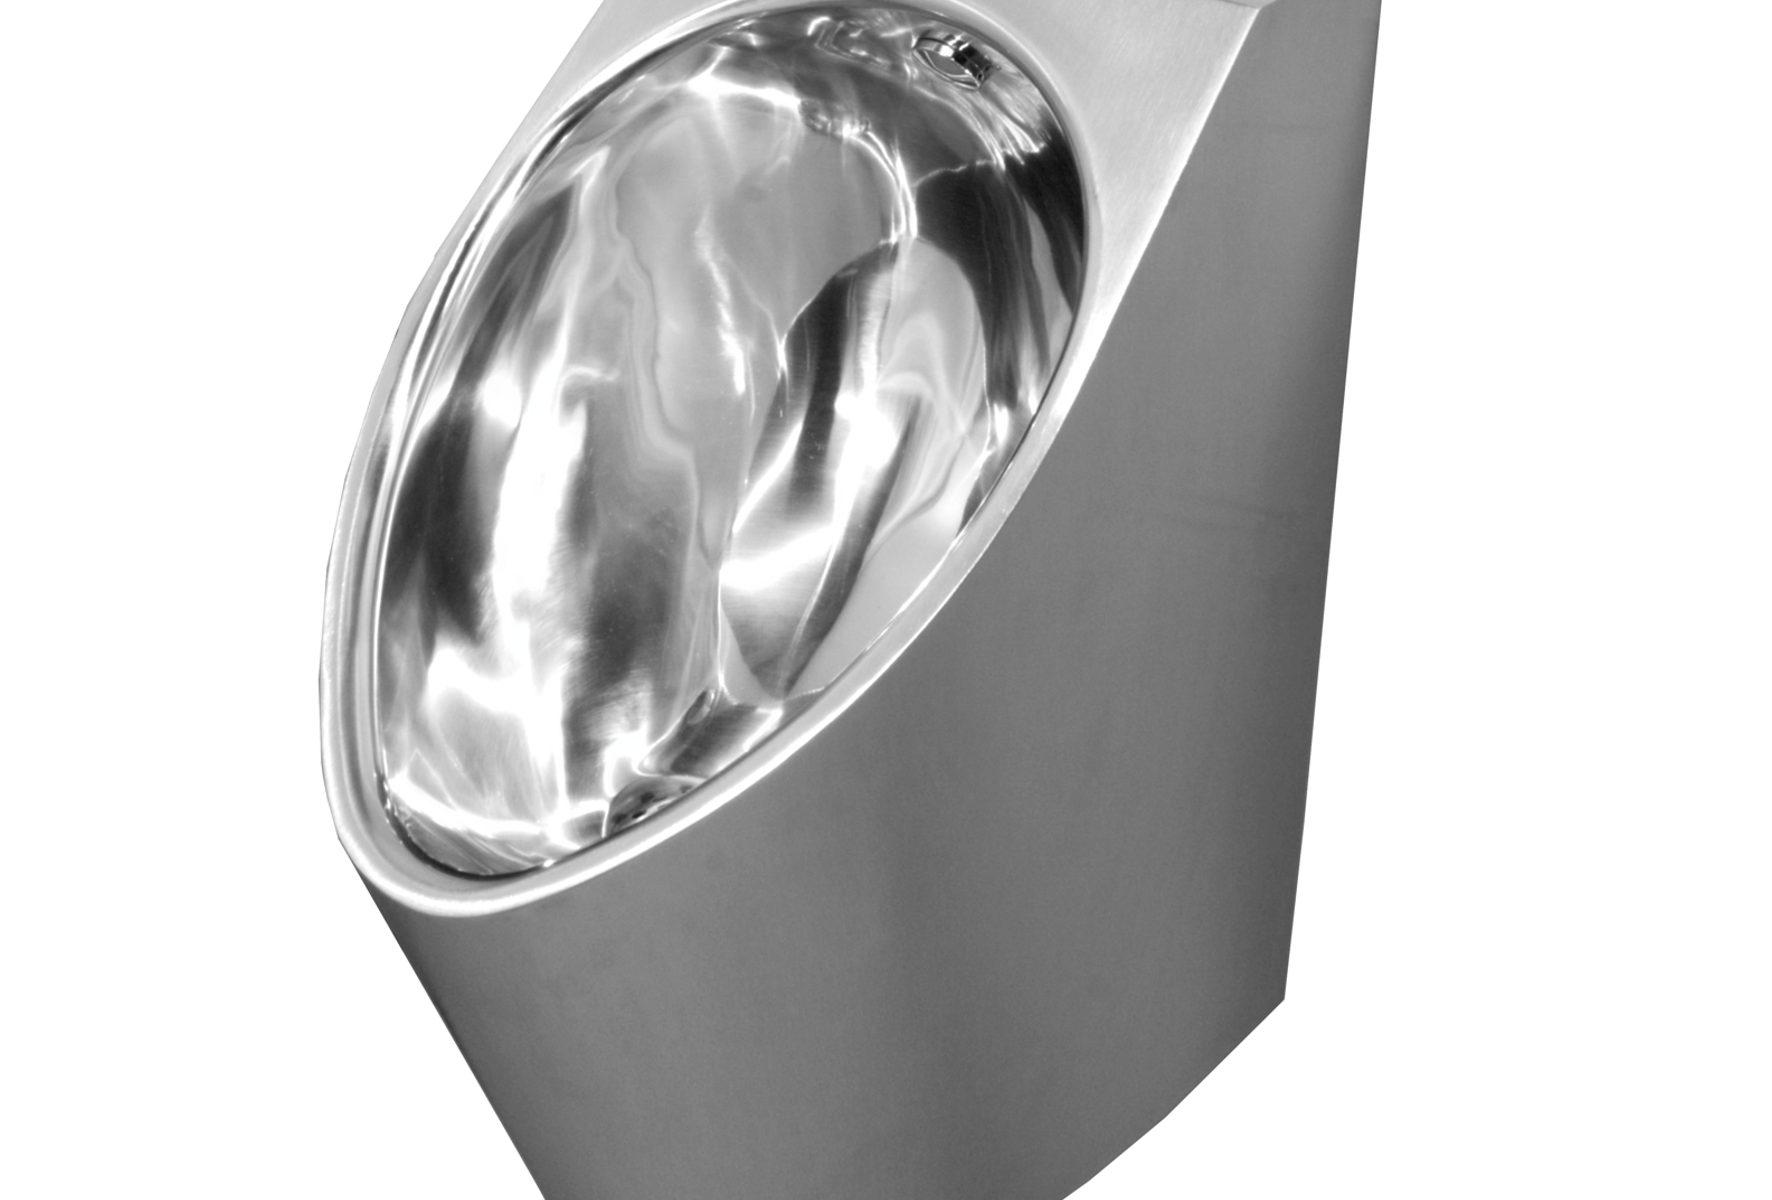 600005 Edelstahl Urinal Komfort 2